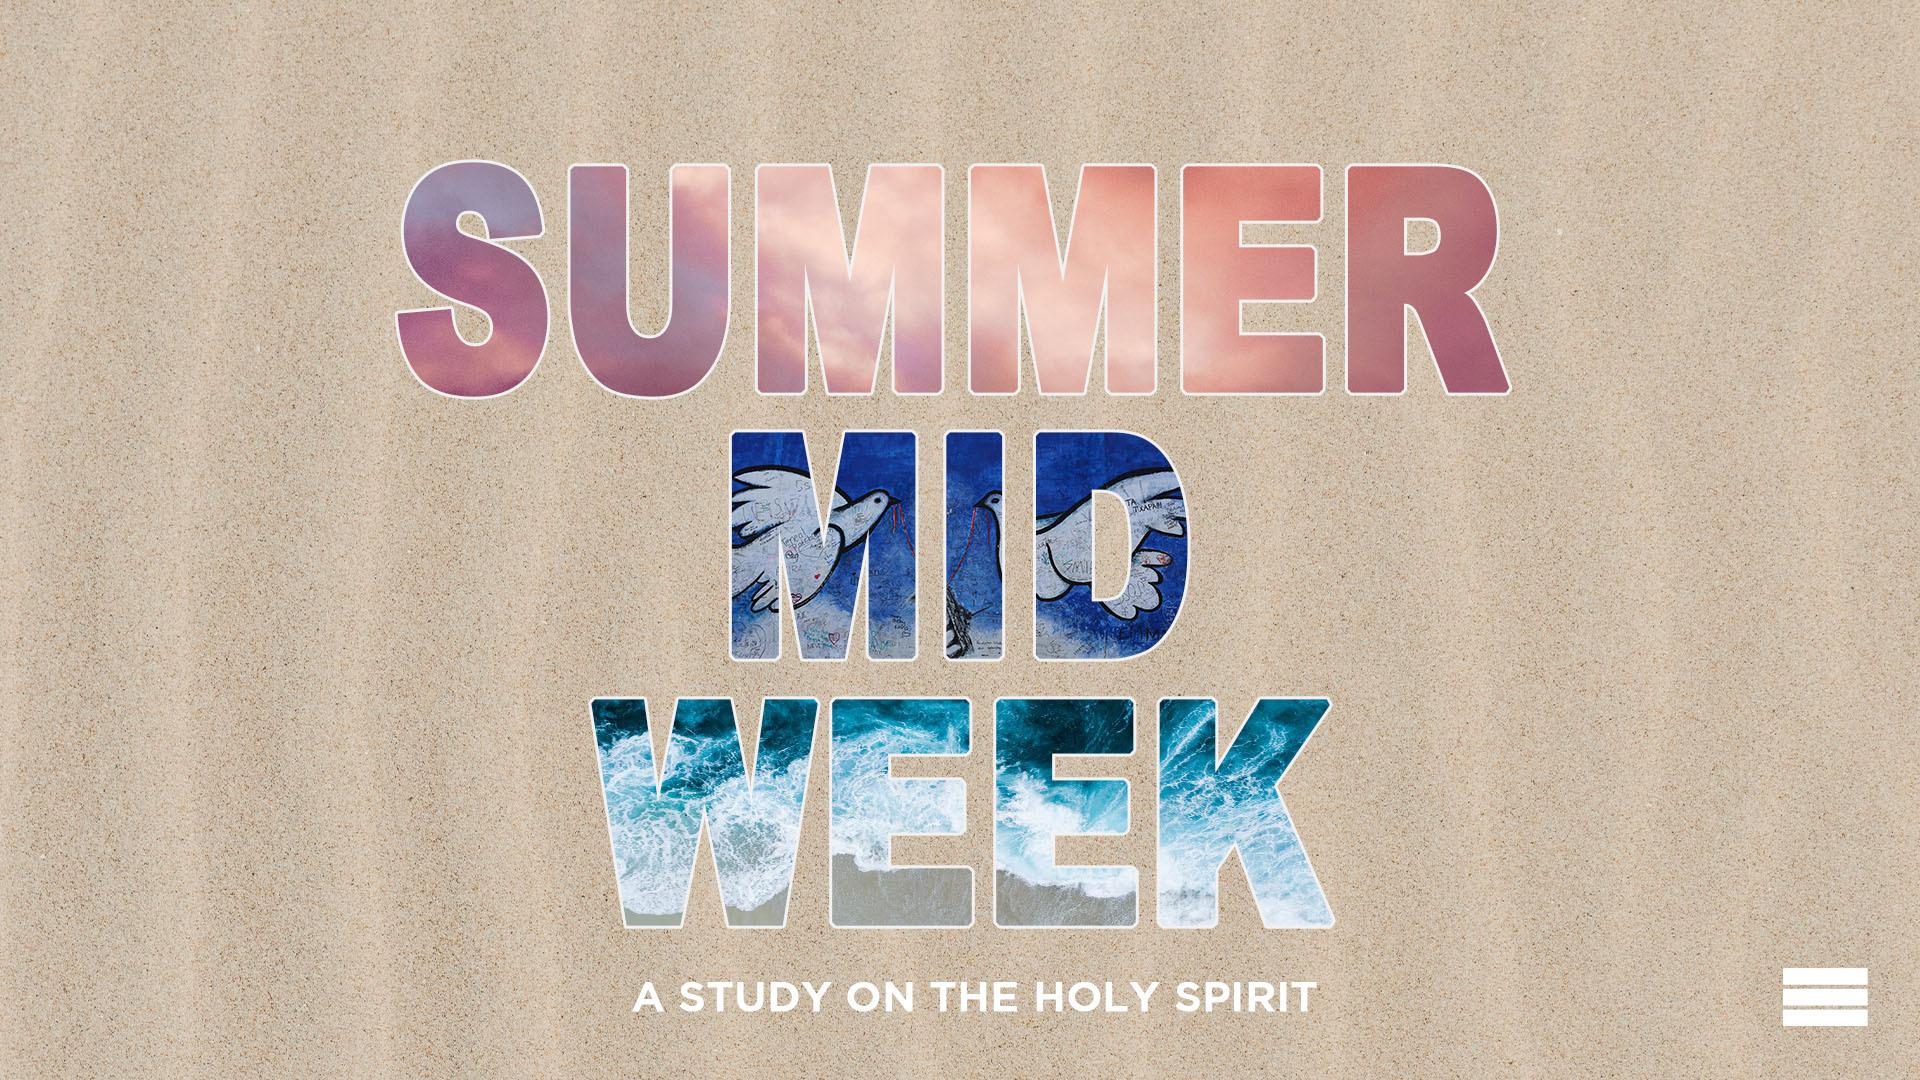 final summer midweek v2 1920x1080 copy (1)